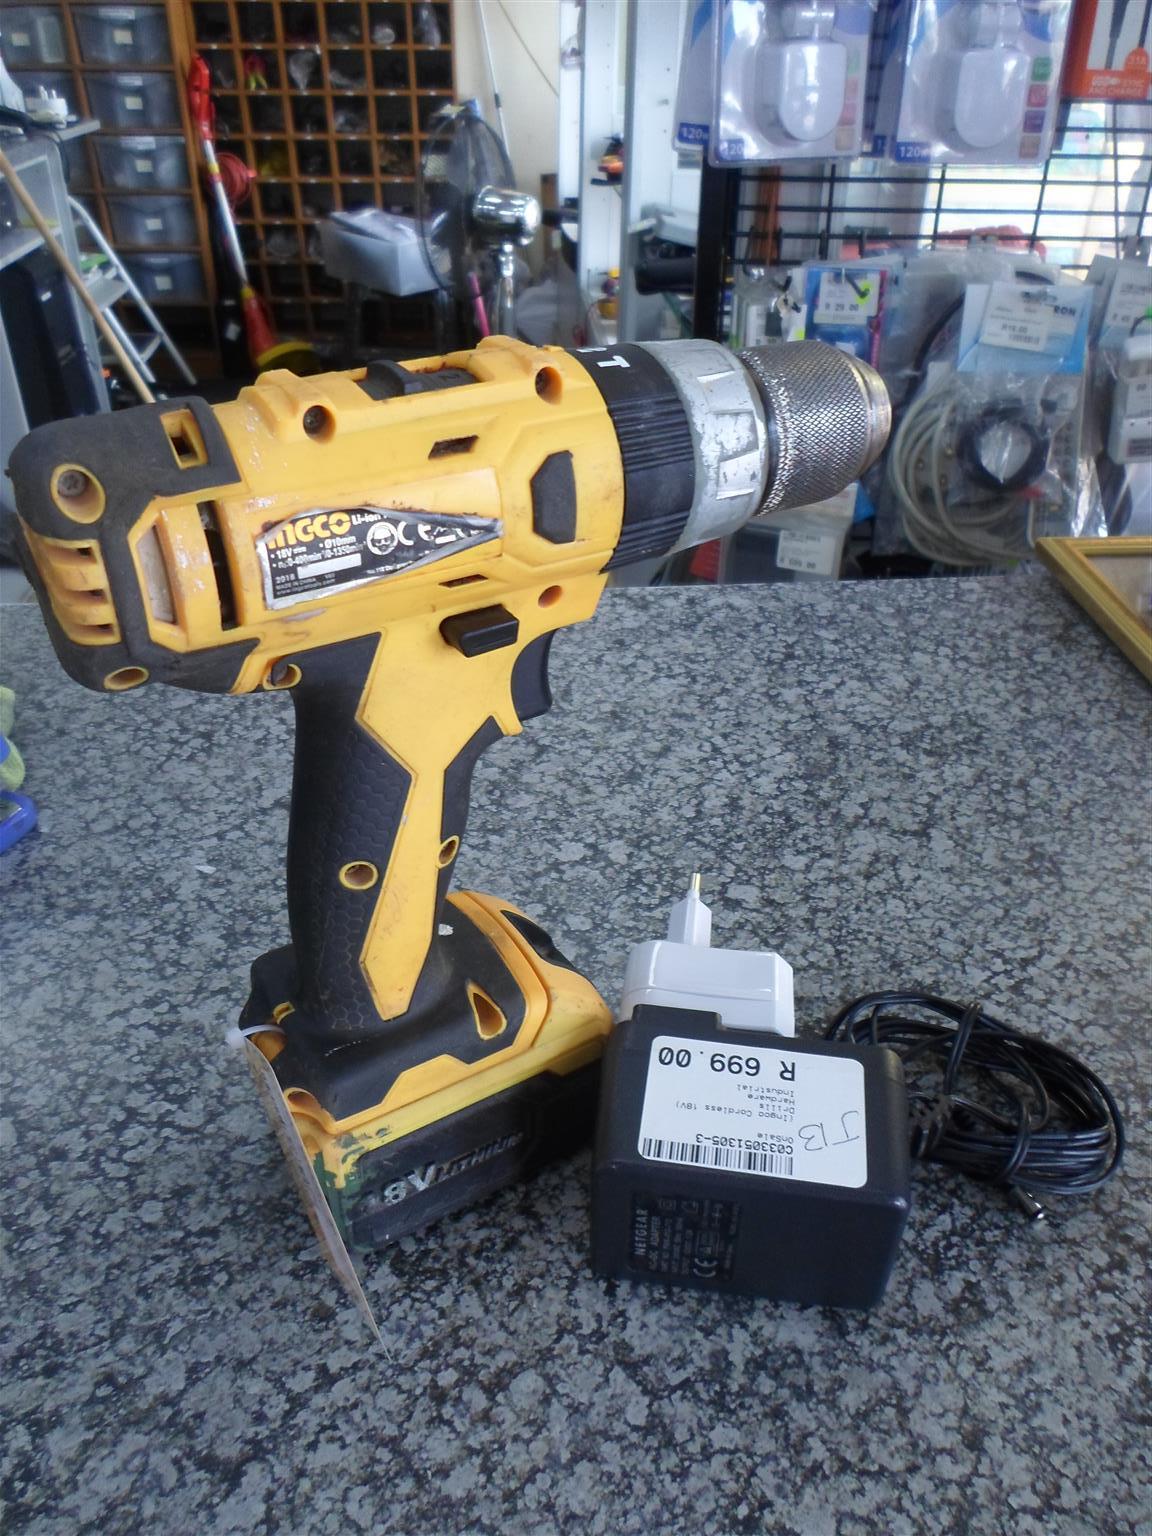 18V Ingco Cordless Drill